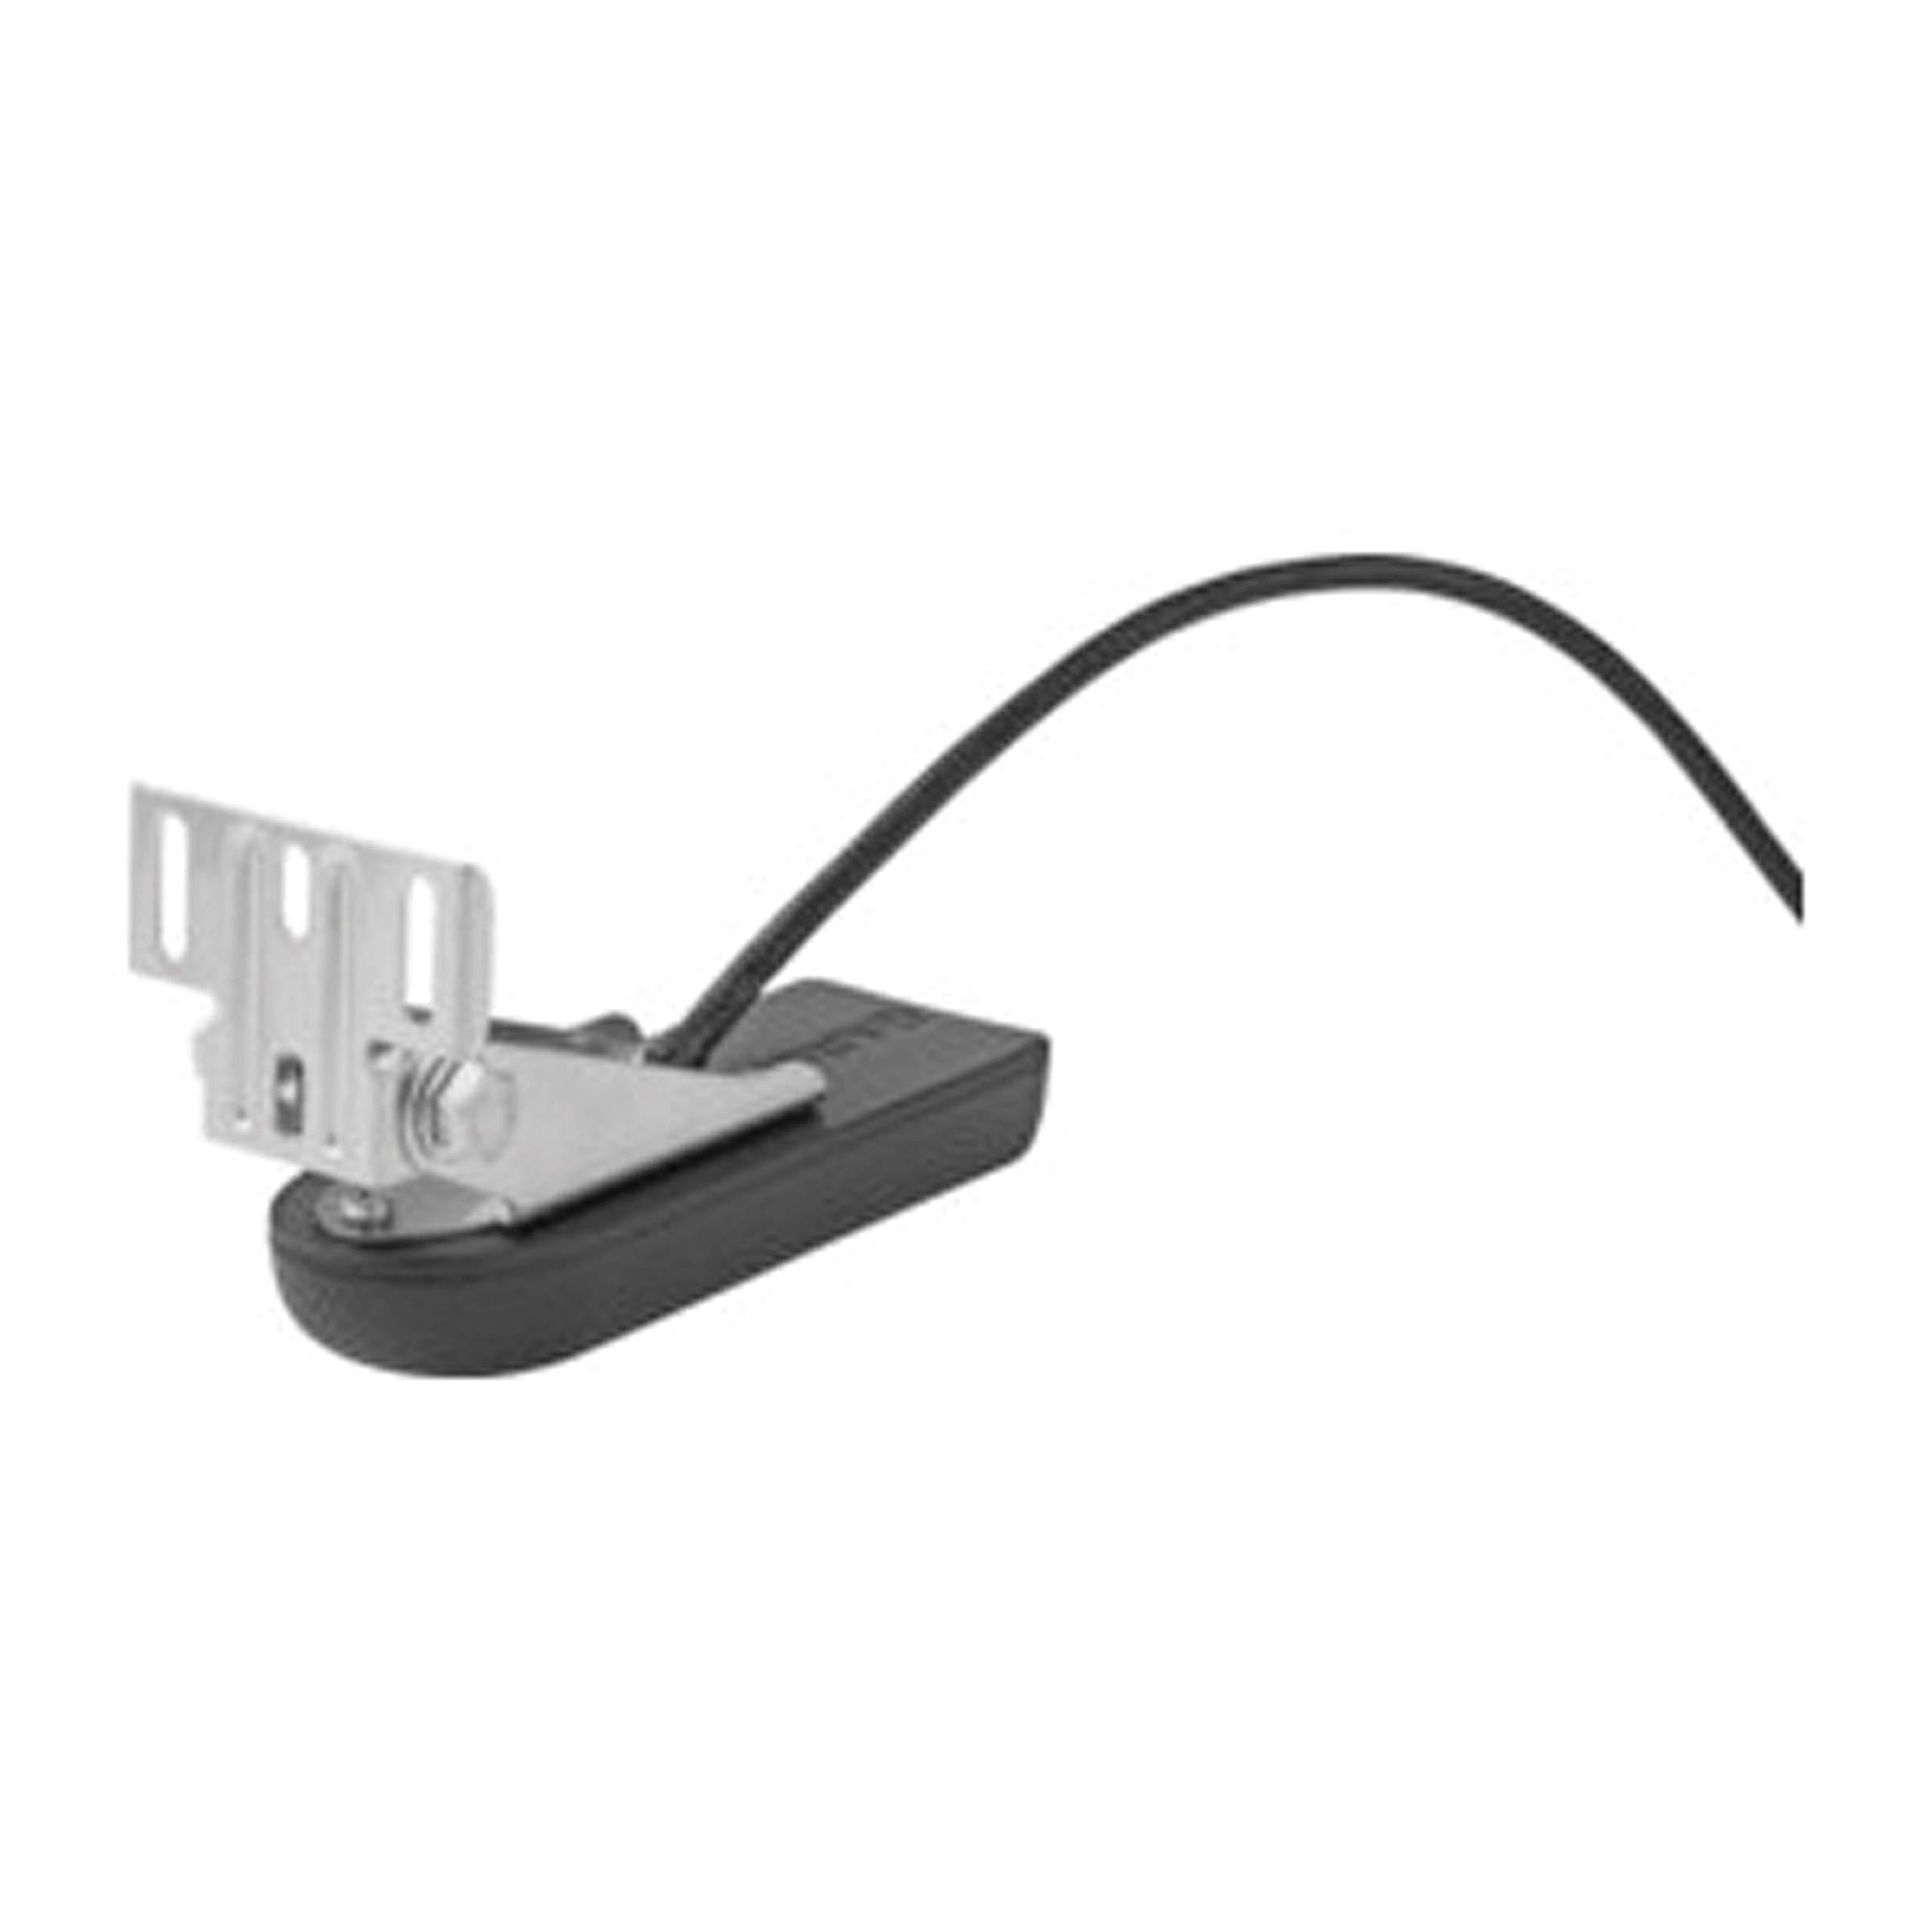 Garmin 010-12403-00 Chirp Transducer 8-Pin by Garmin